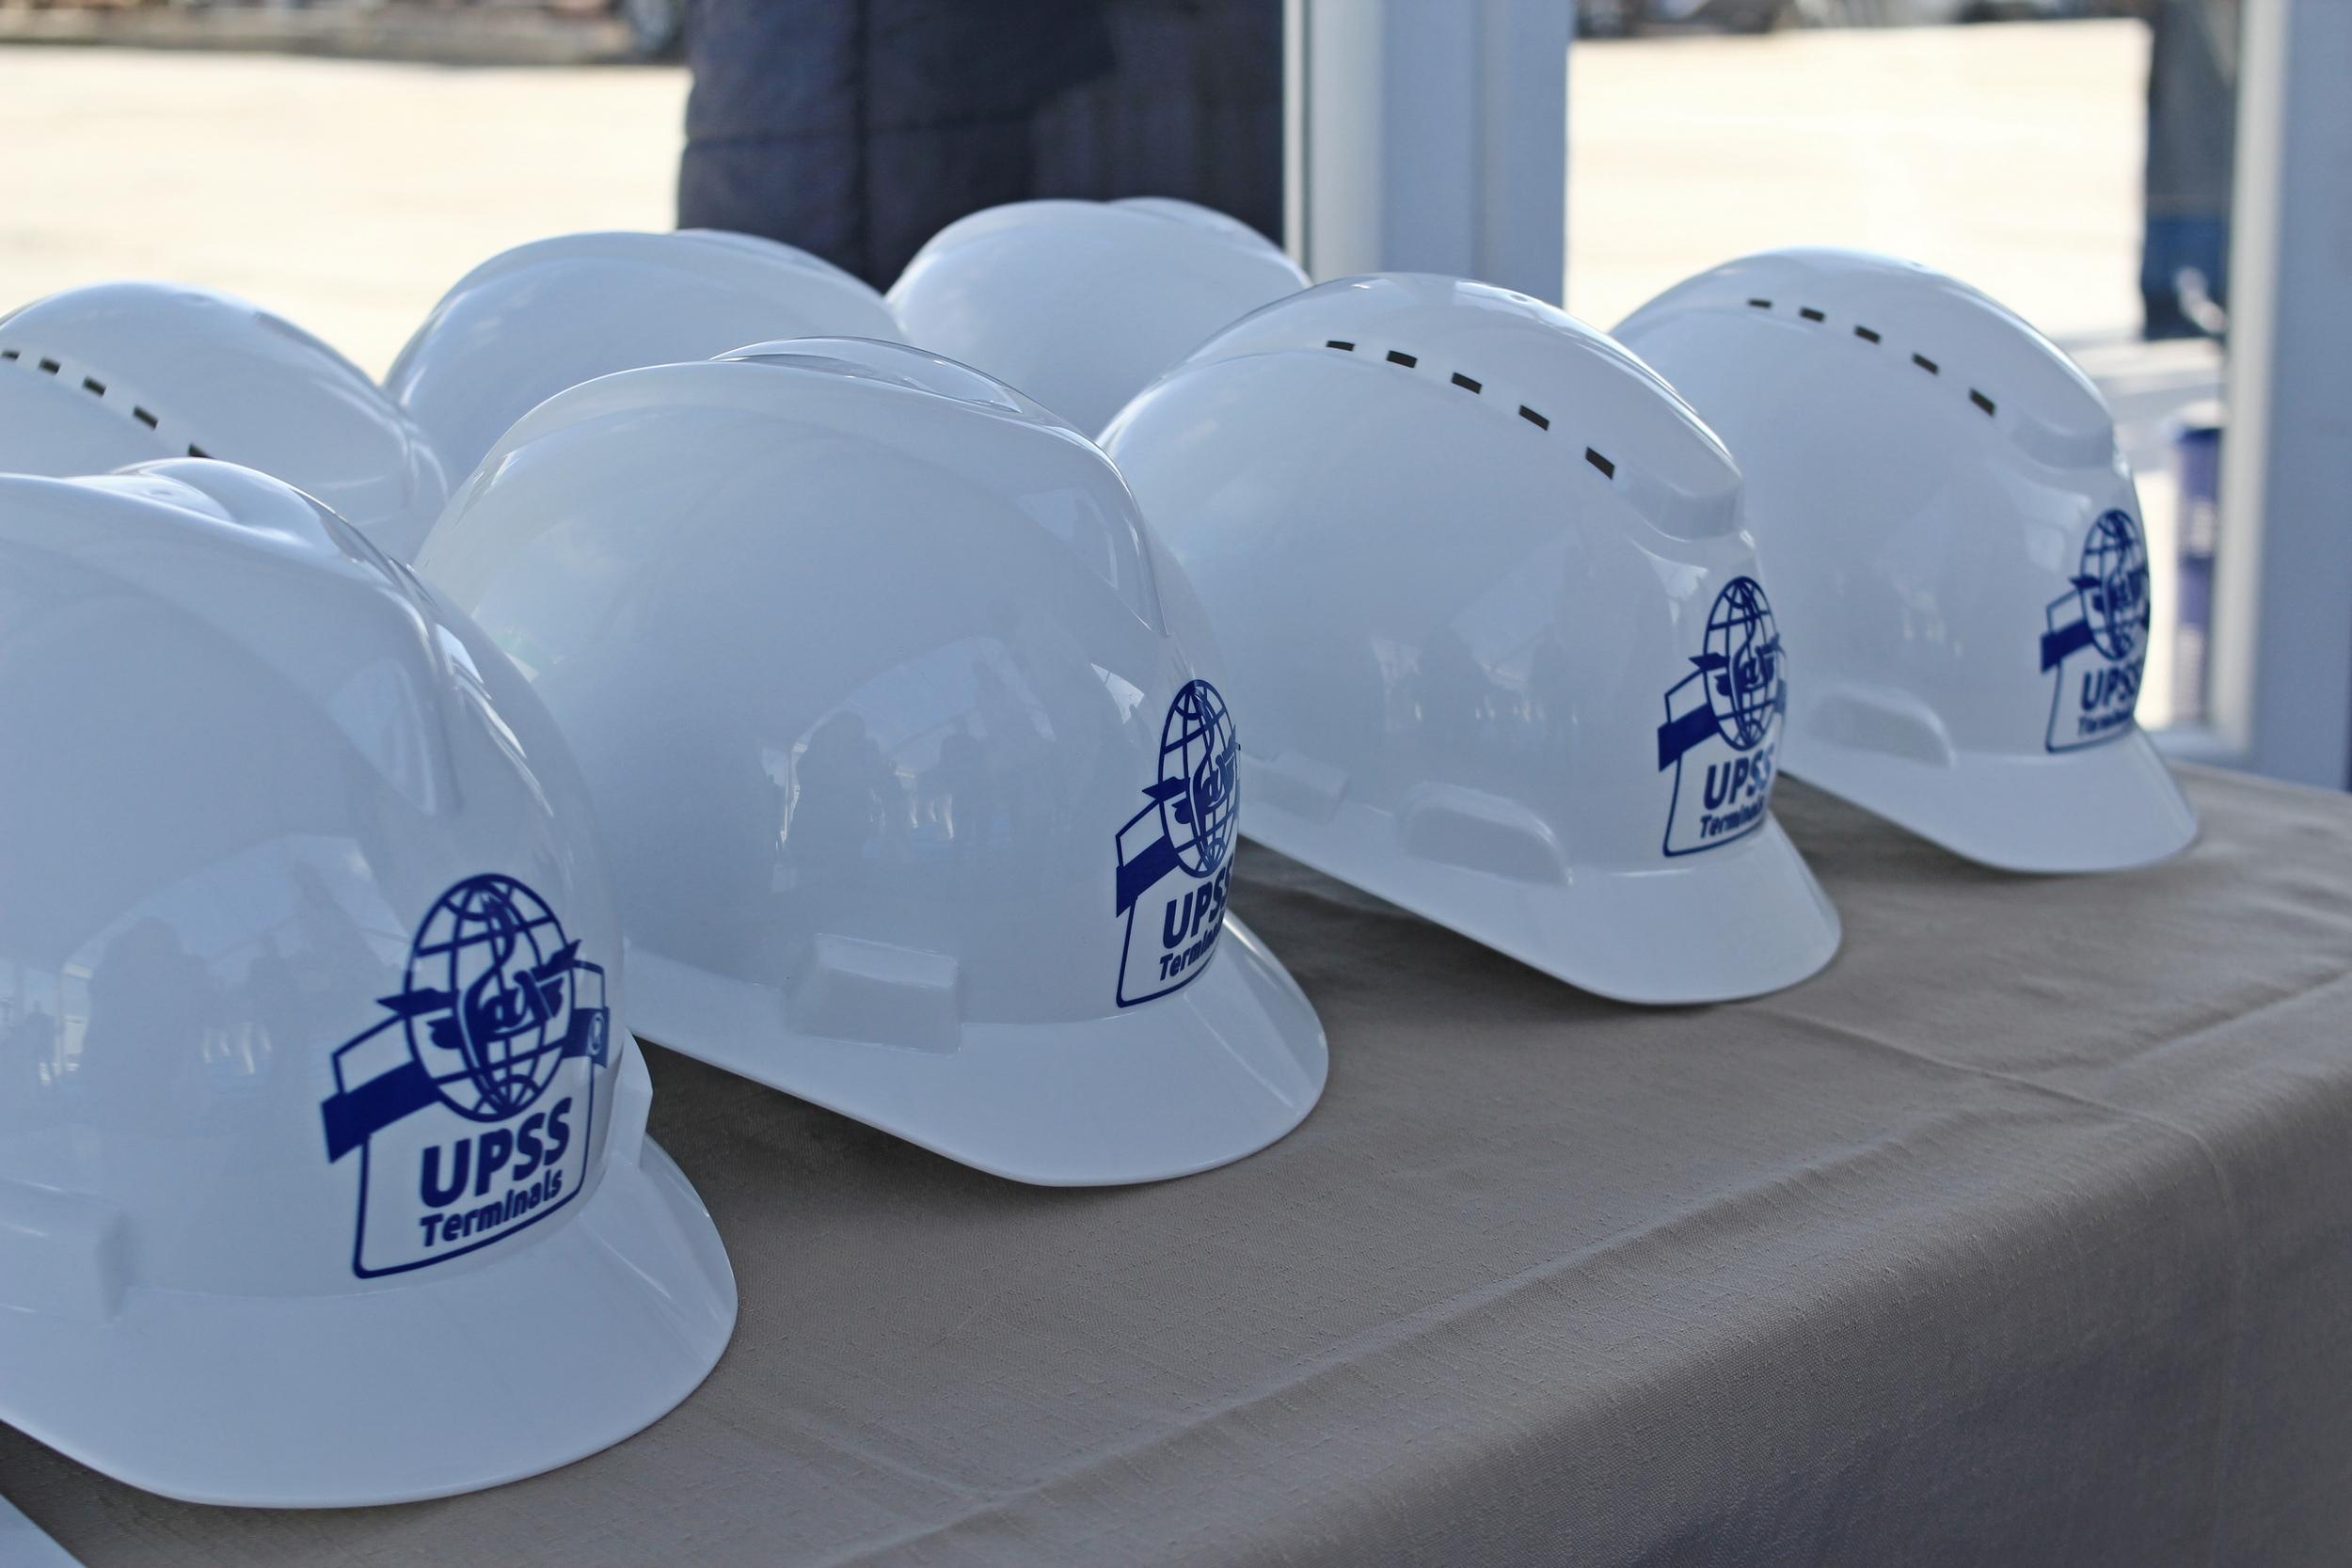 Открытие терминала UPSS Николаев Бихеппи